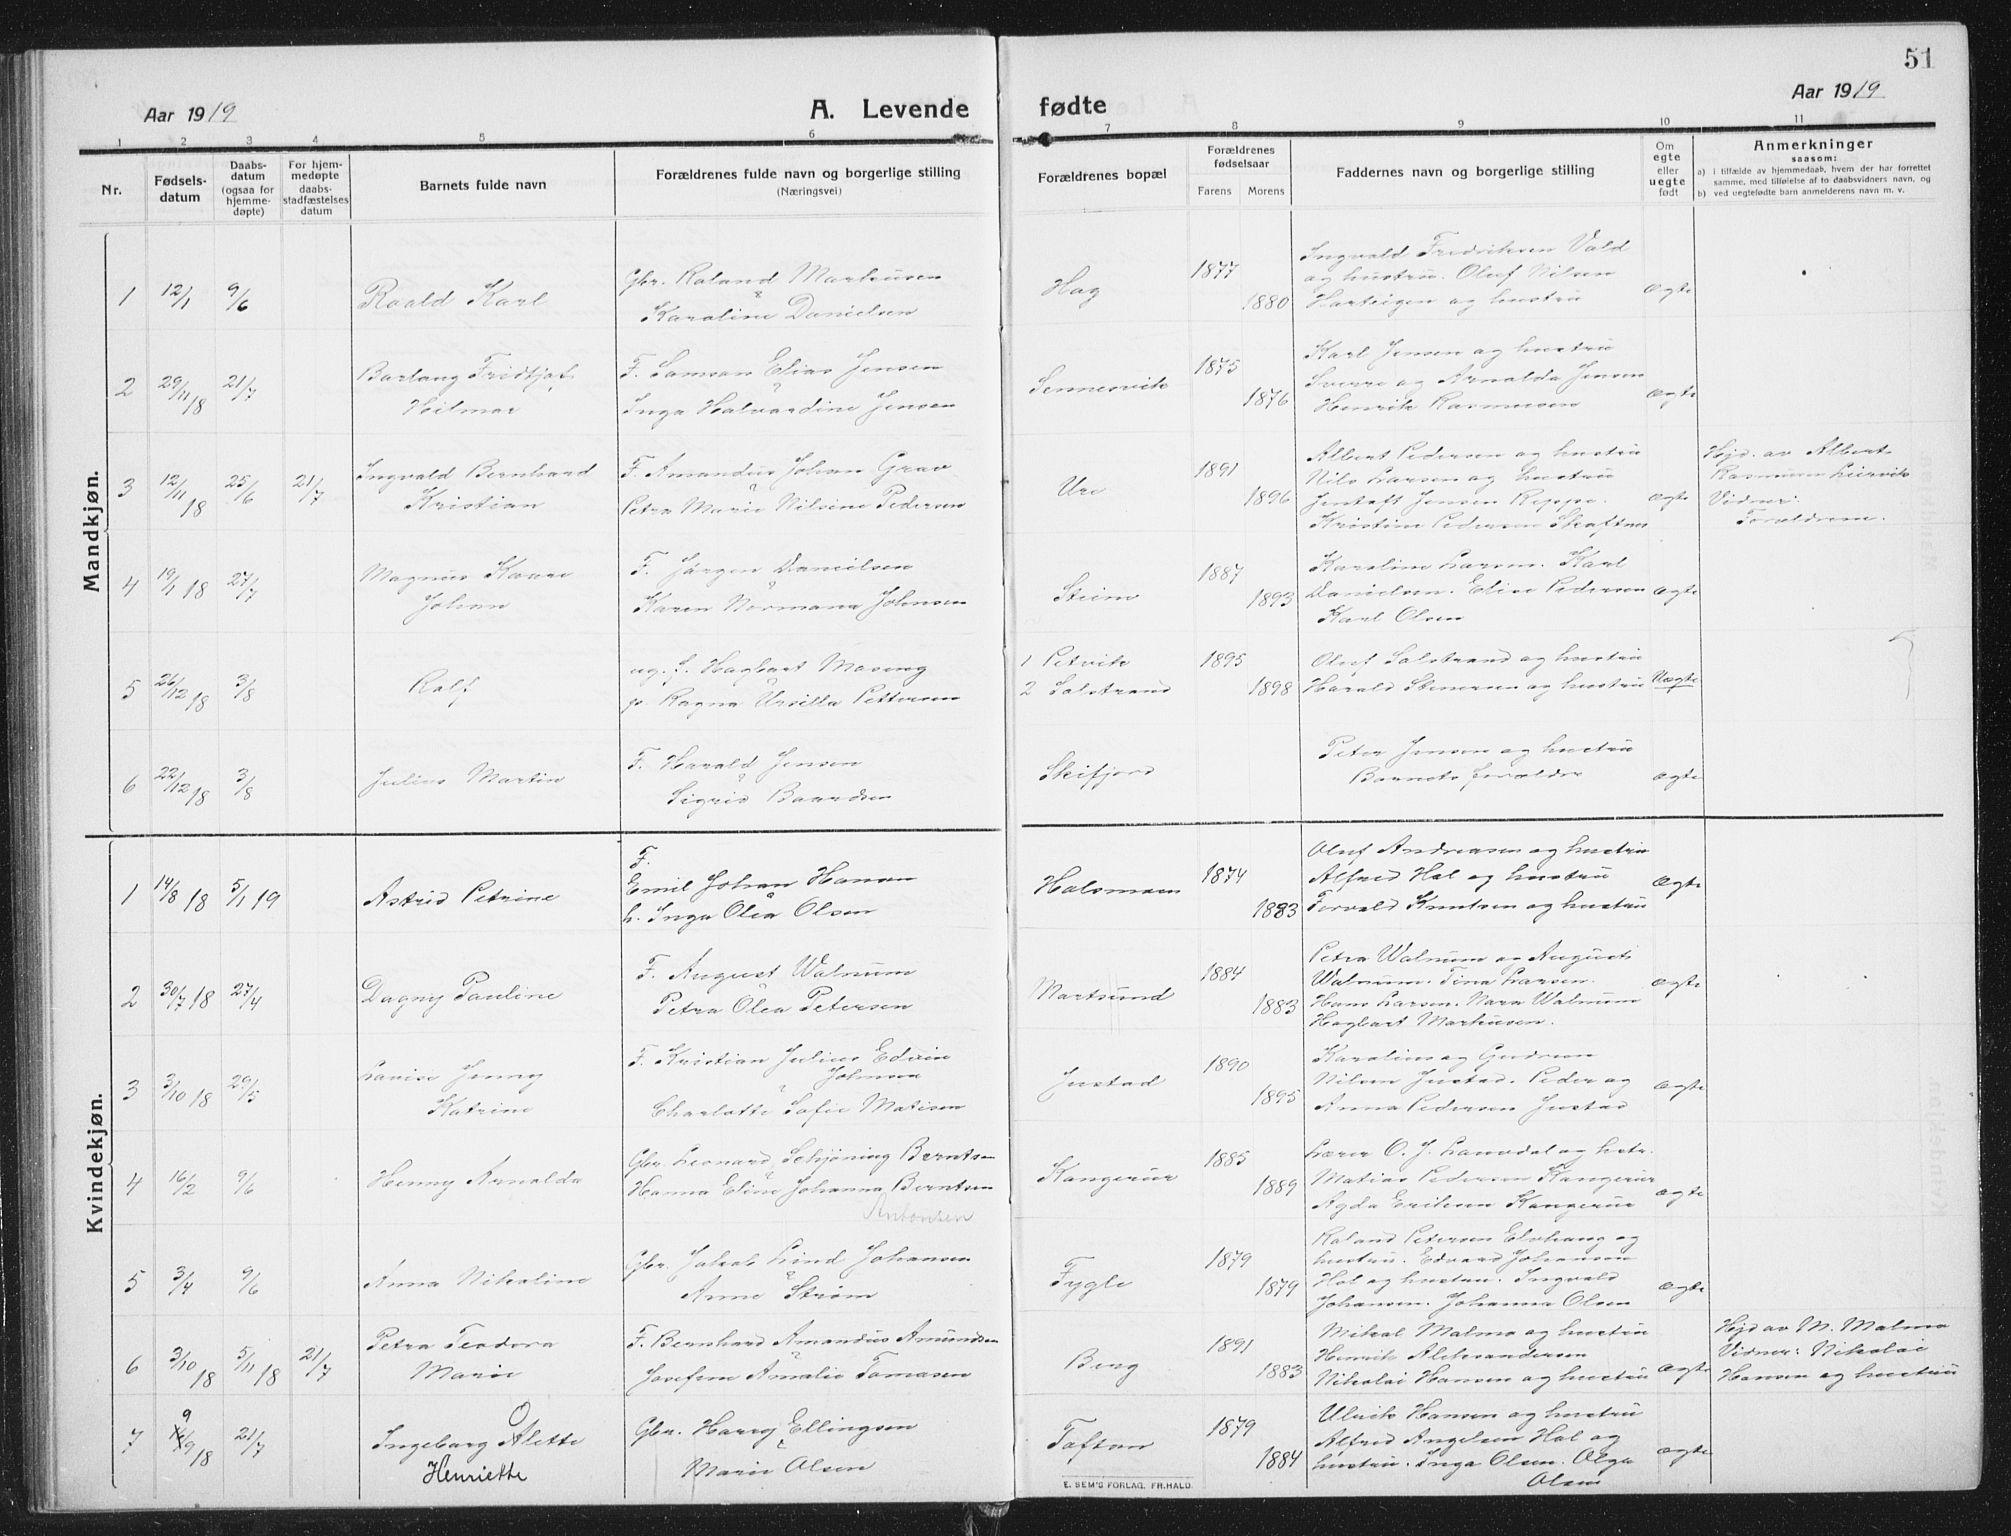 SAT, Ministerialprotokoller, klokkerbøker og fødselsregistre - Nordland, 882/L1183: Klokkerbok nr. 882C01, 1911-1938, s. 51